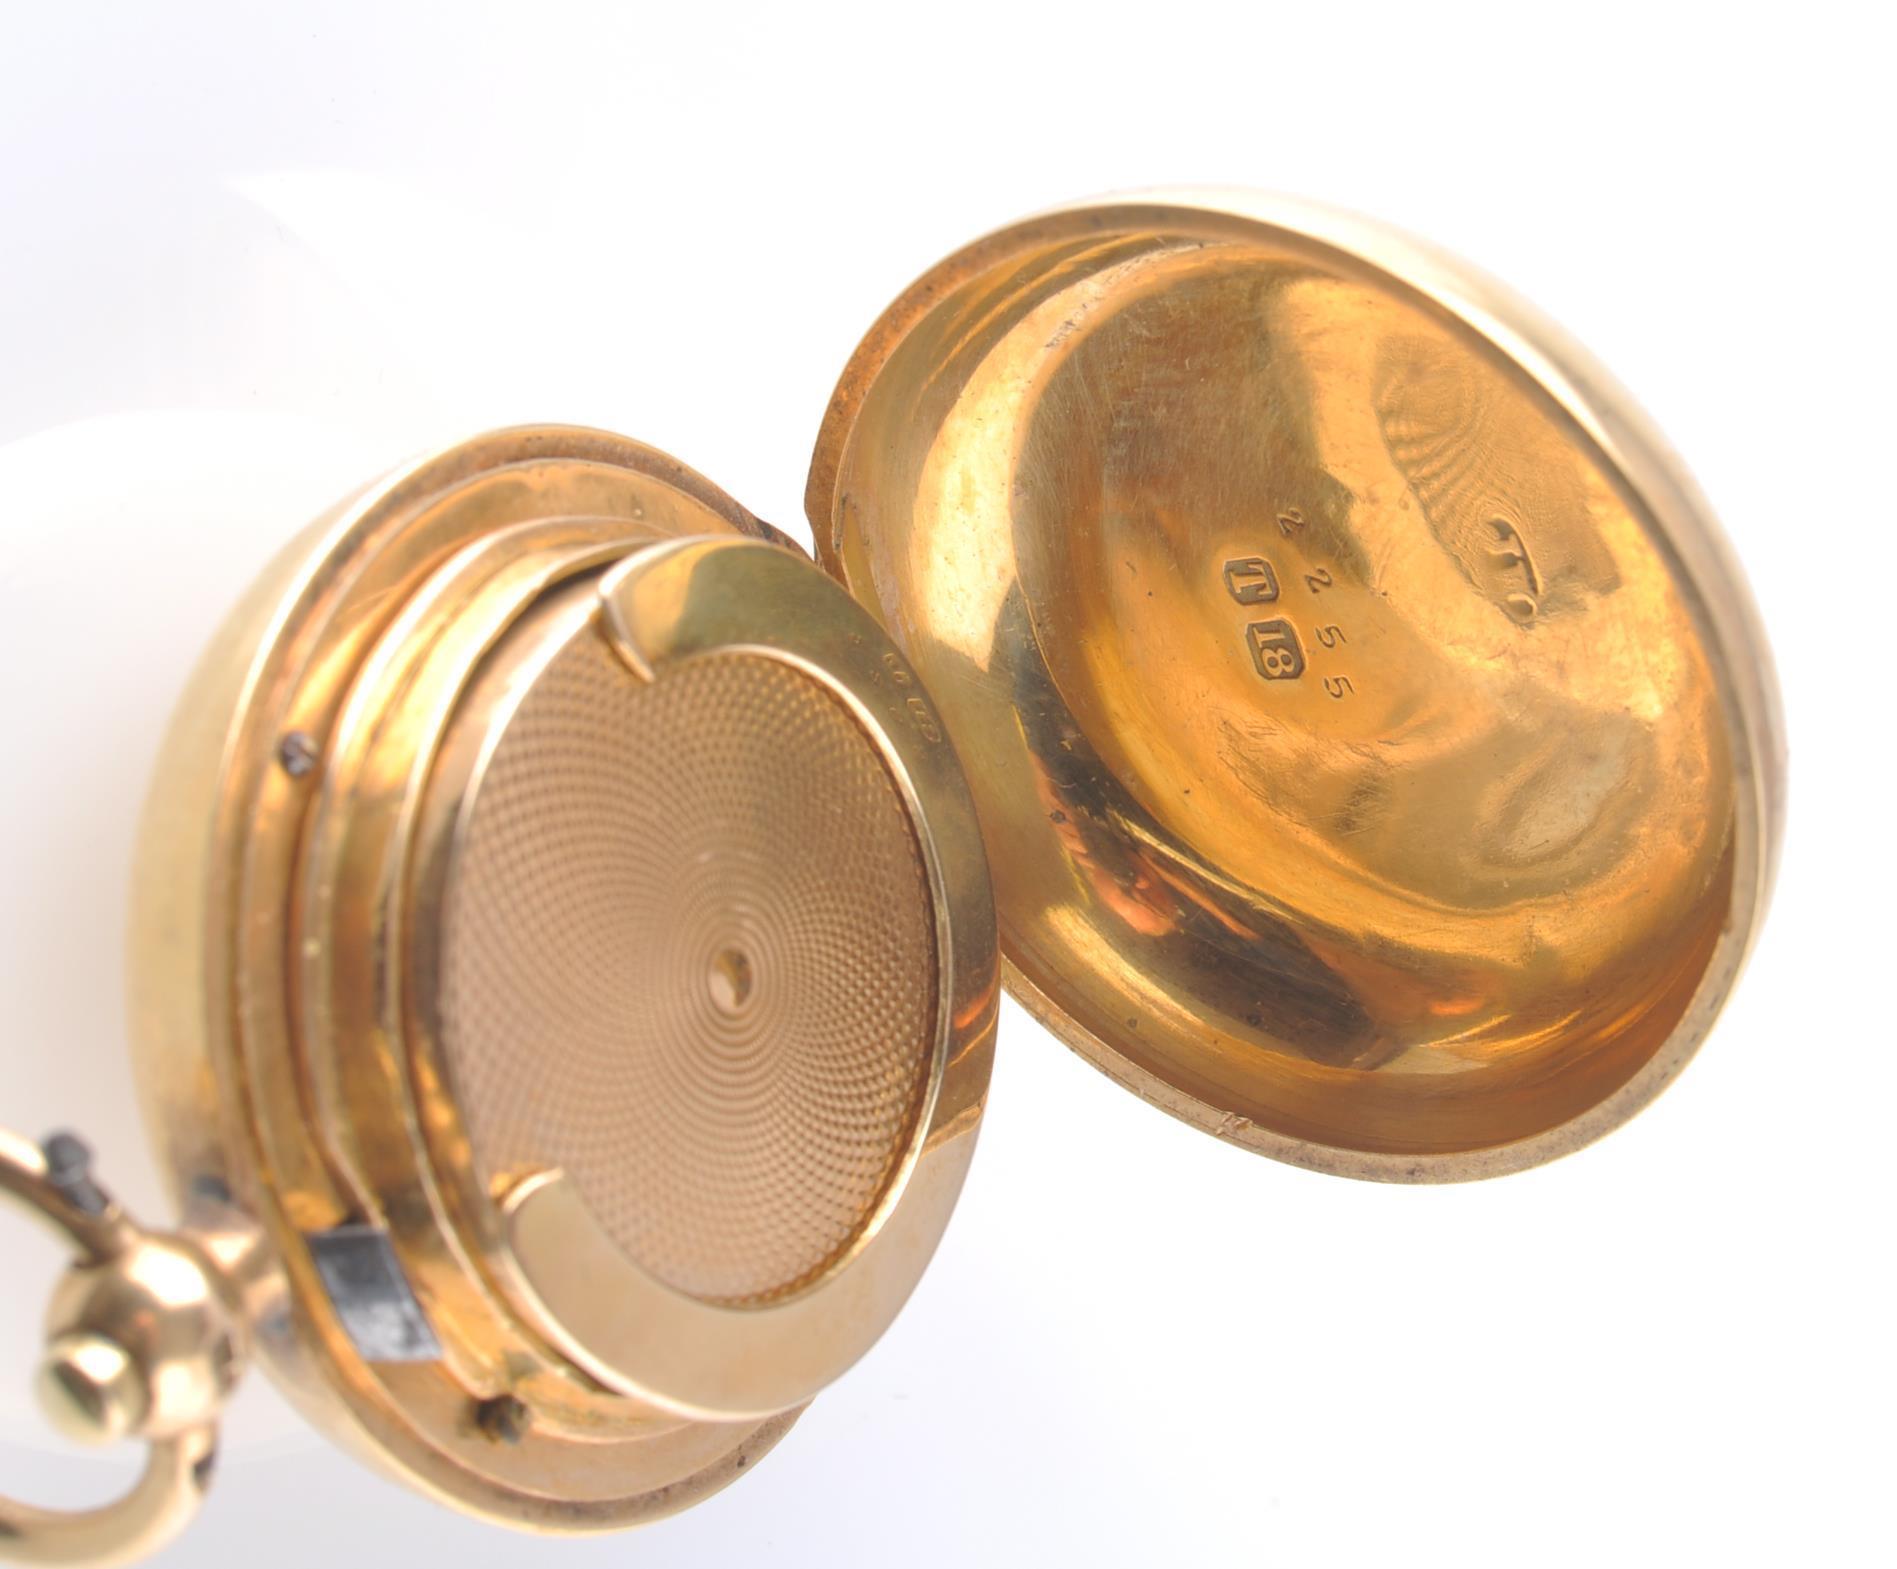 18CT GOLD HALLMARKED VICTORIAN SOVEREIGN HOLDER - Image 7 of 7